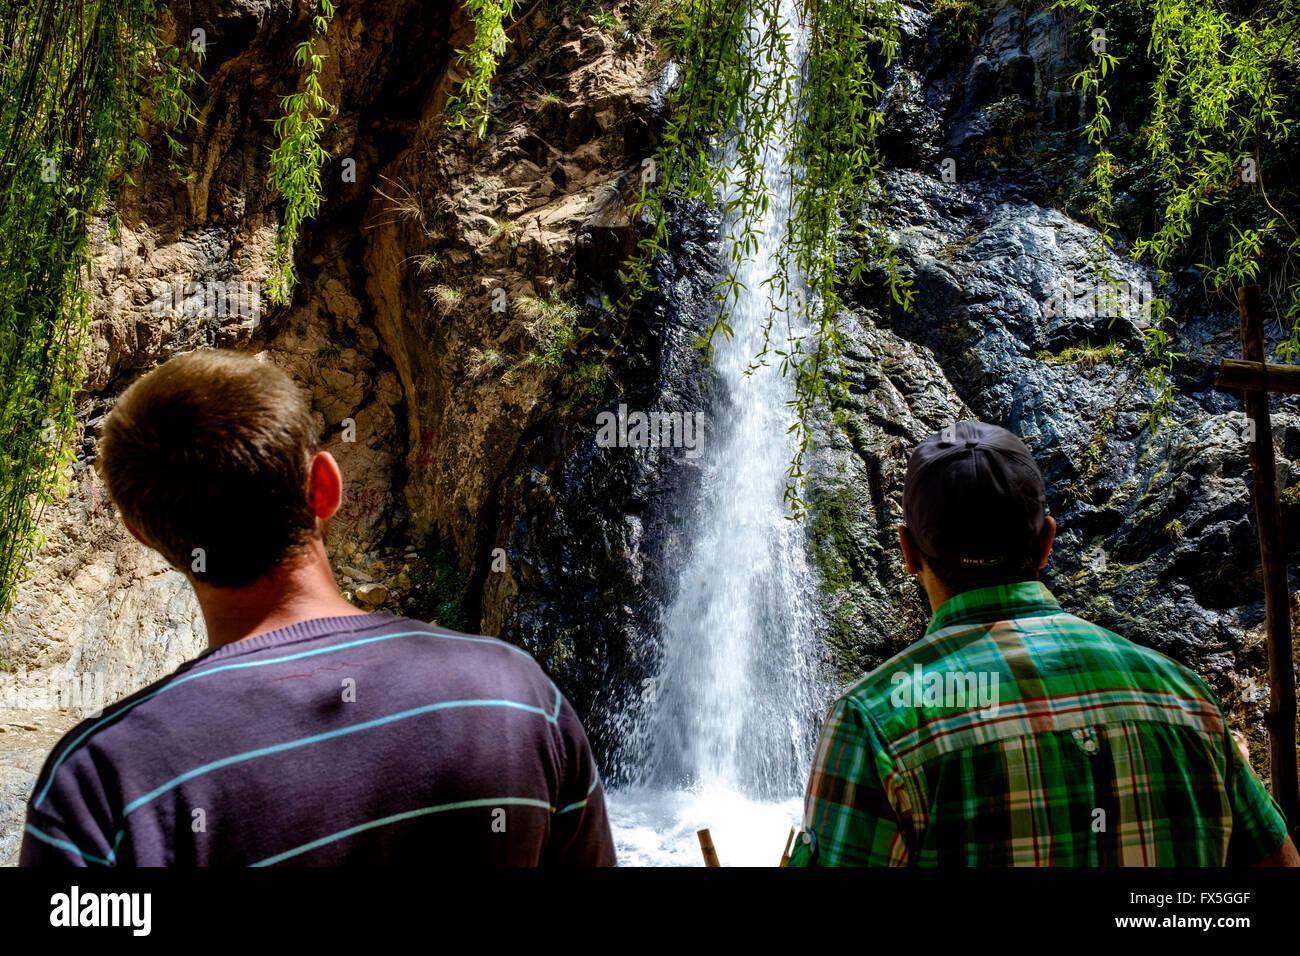 The Setti-Fatma waterfall (Cascades de Setti Fatma or Cascades Ourika) in the Ourika Valley, Morocco, North Africa Stock Photo